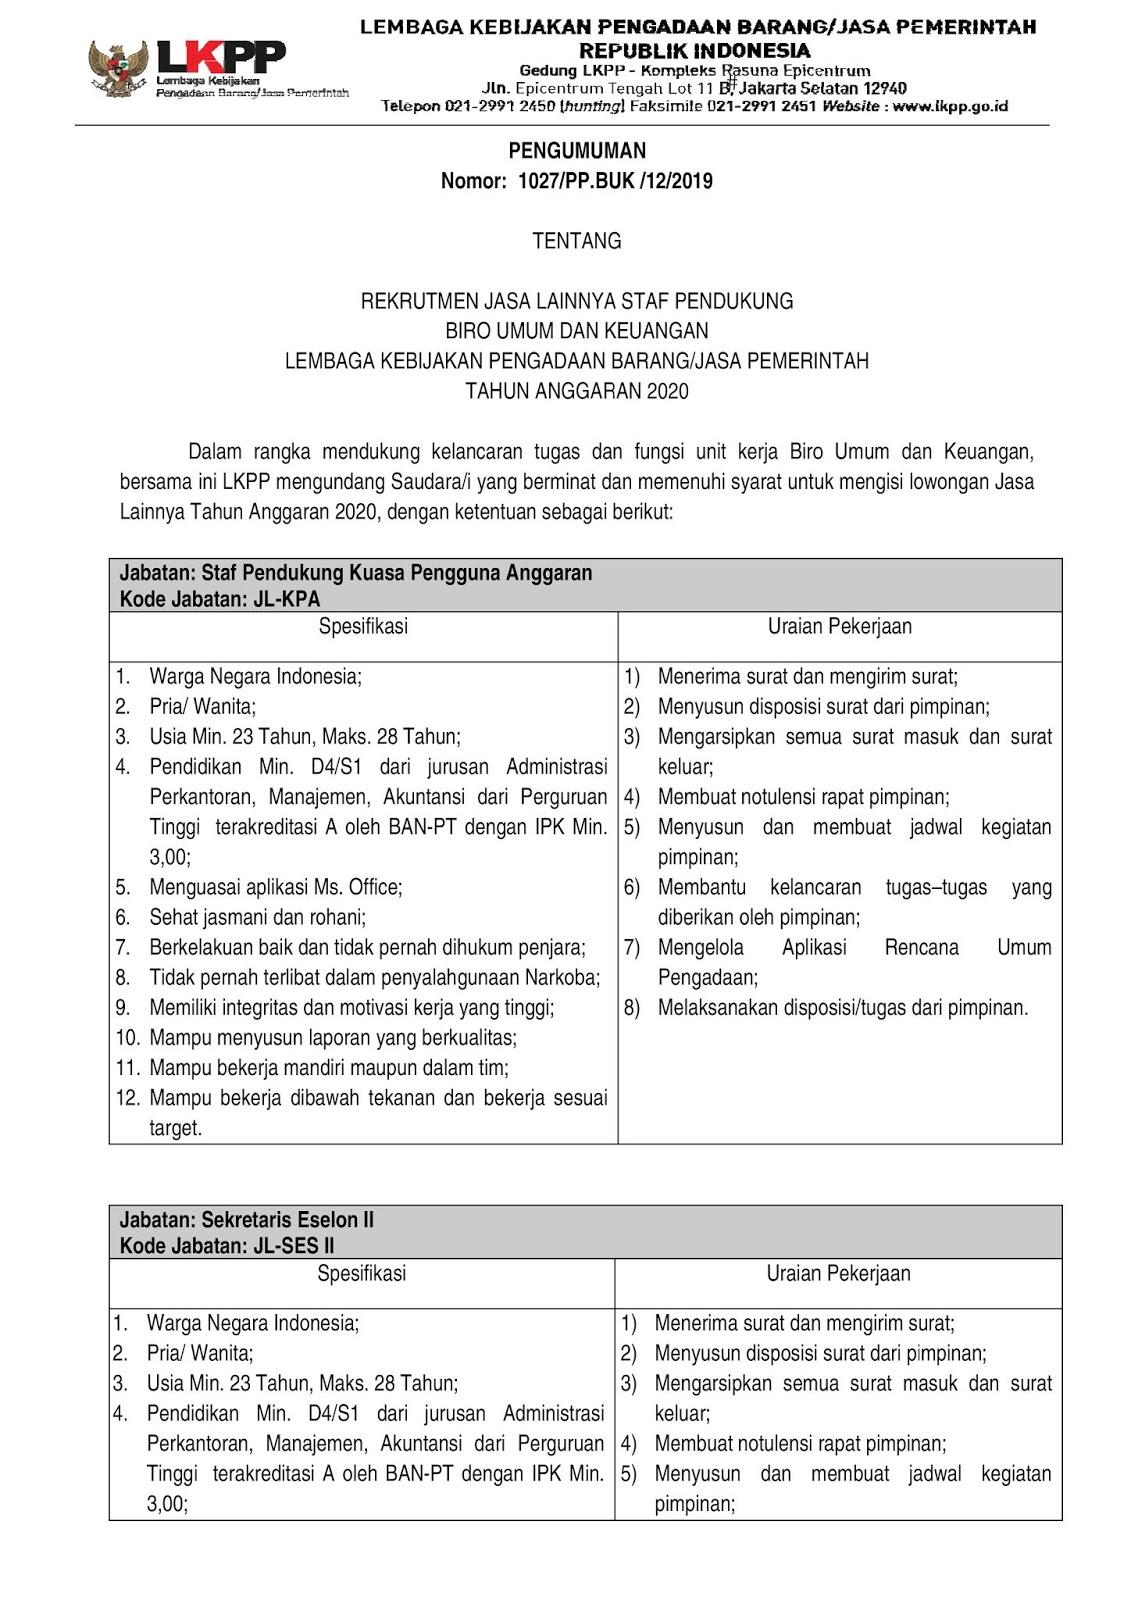 Rekrutmen Pegawai Non PNS Biro Umum dan Keuangan LKPP Januari 2020